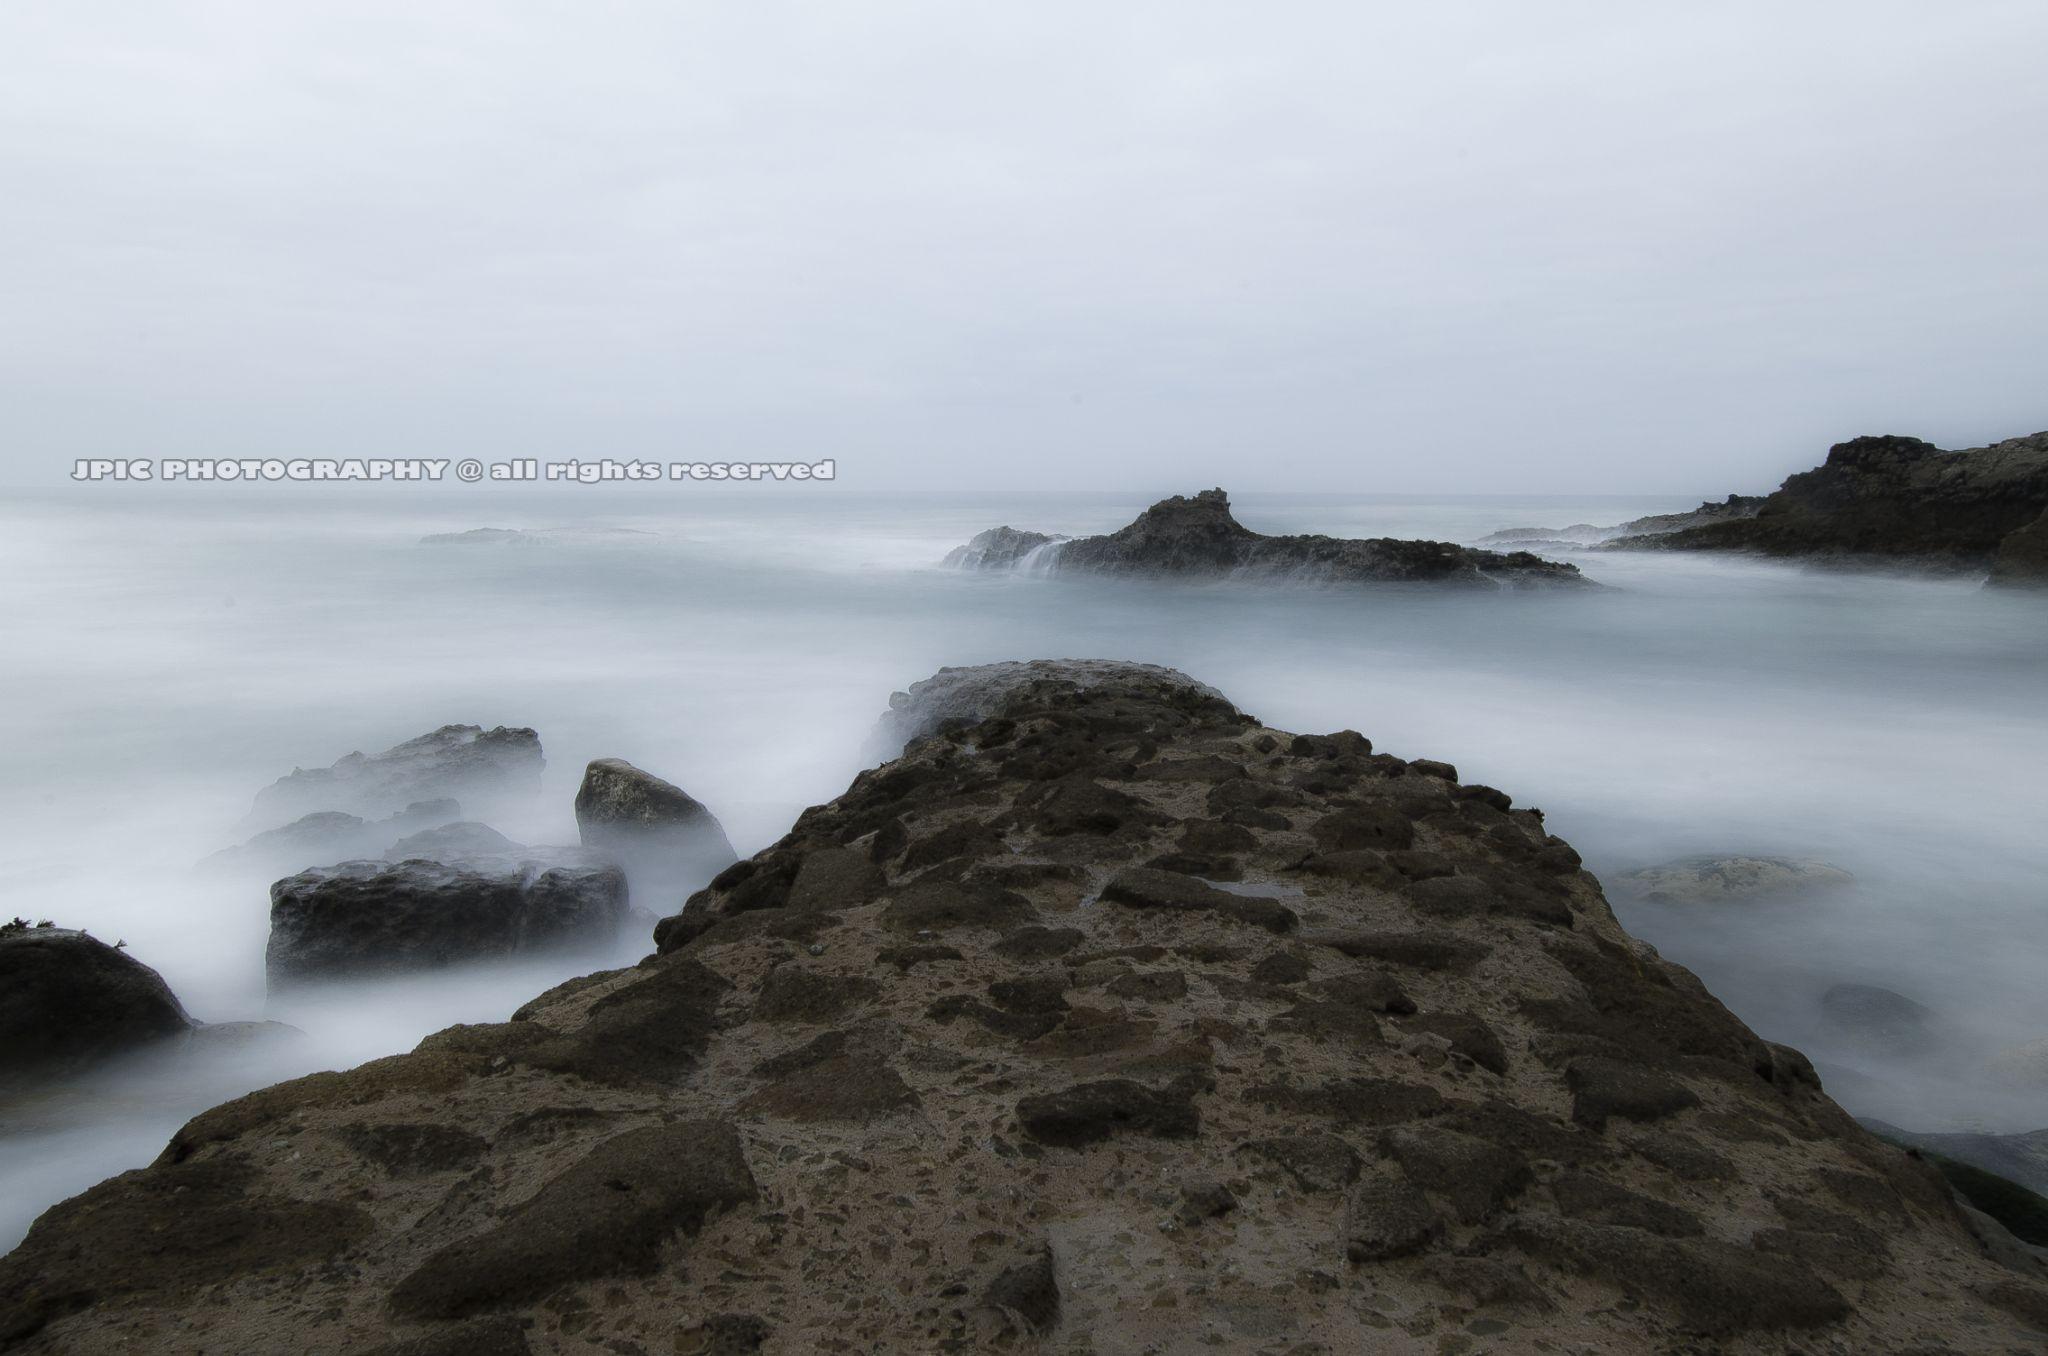 Through the sea by Joao Pedro Pereira